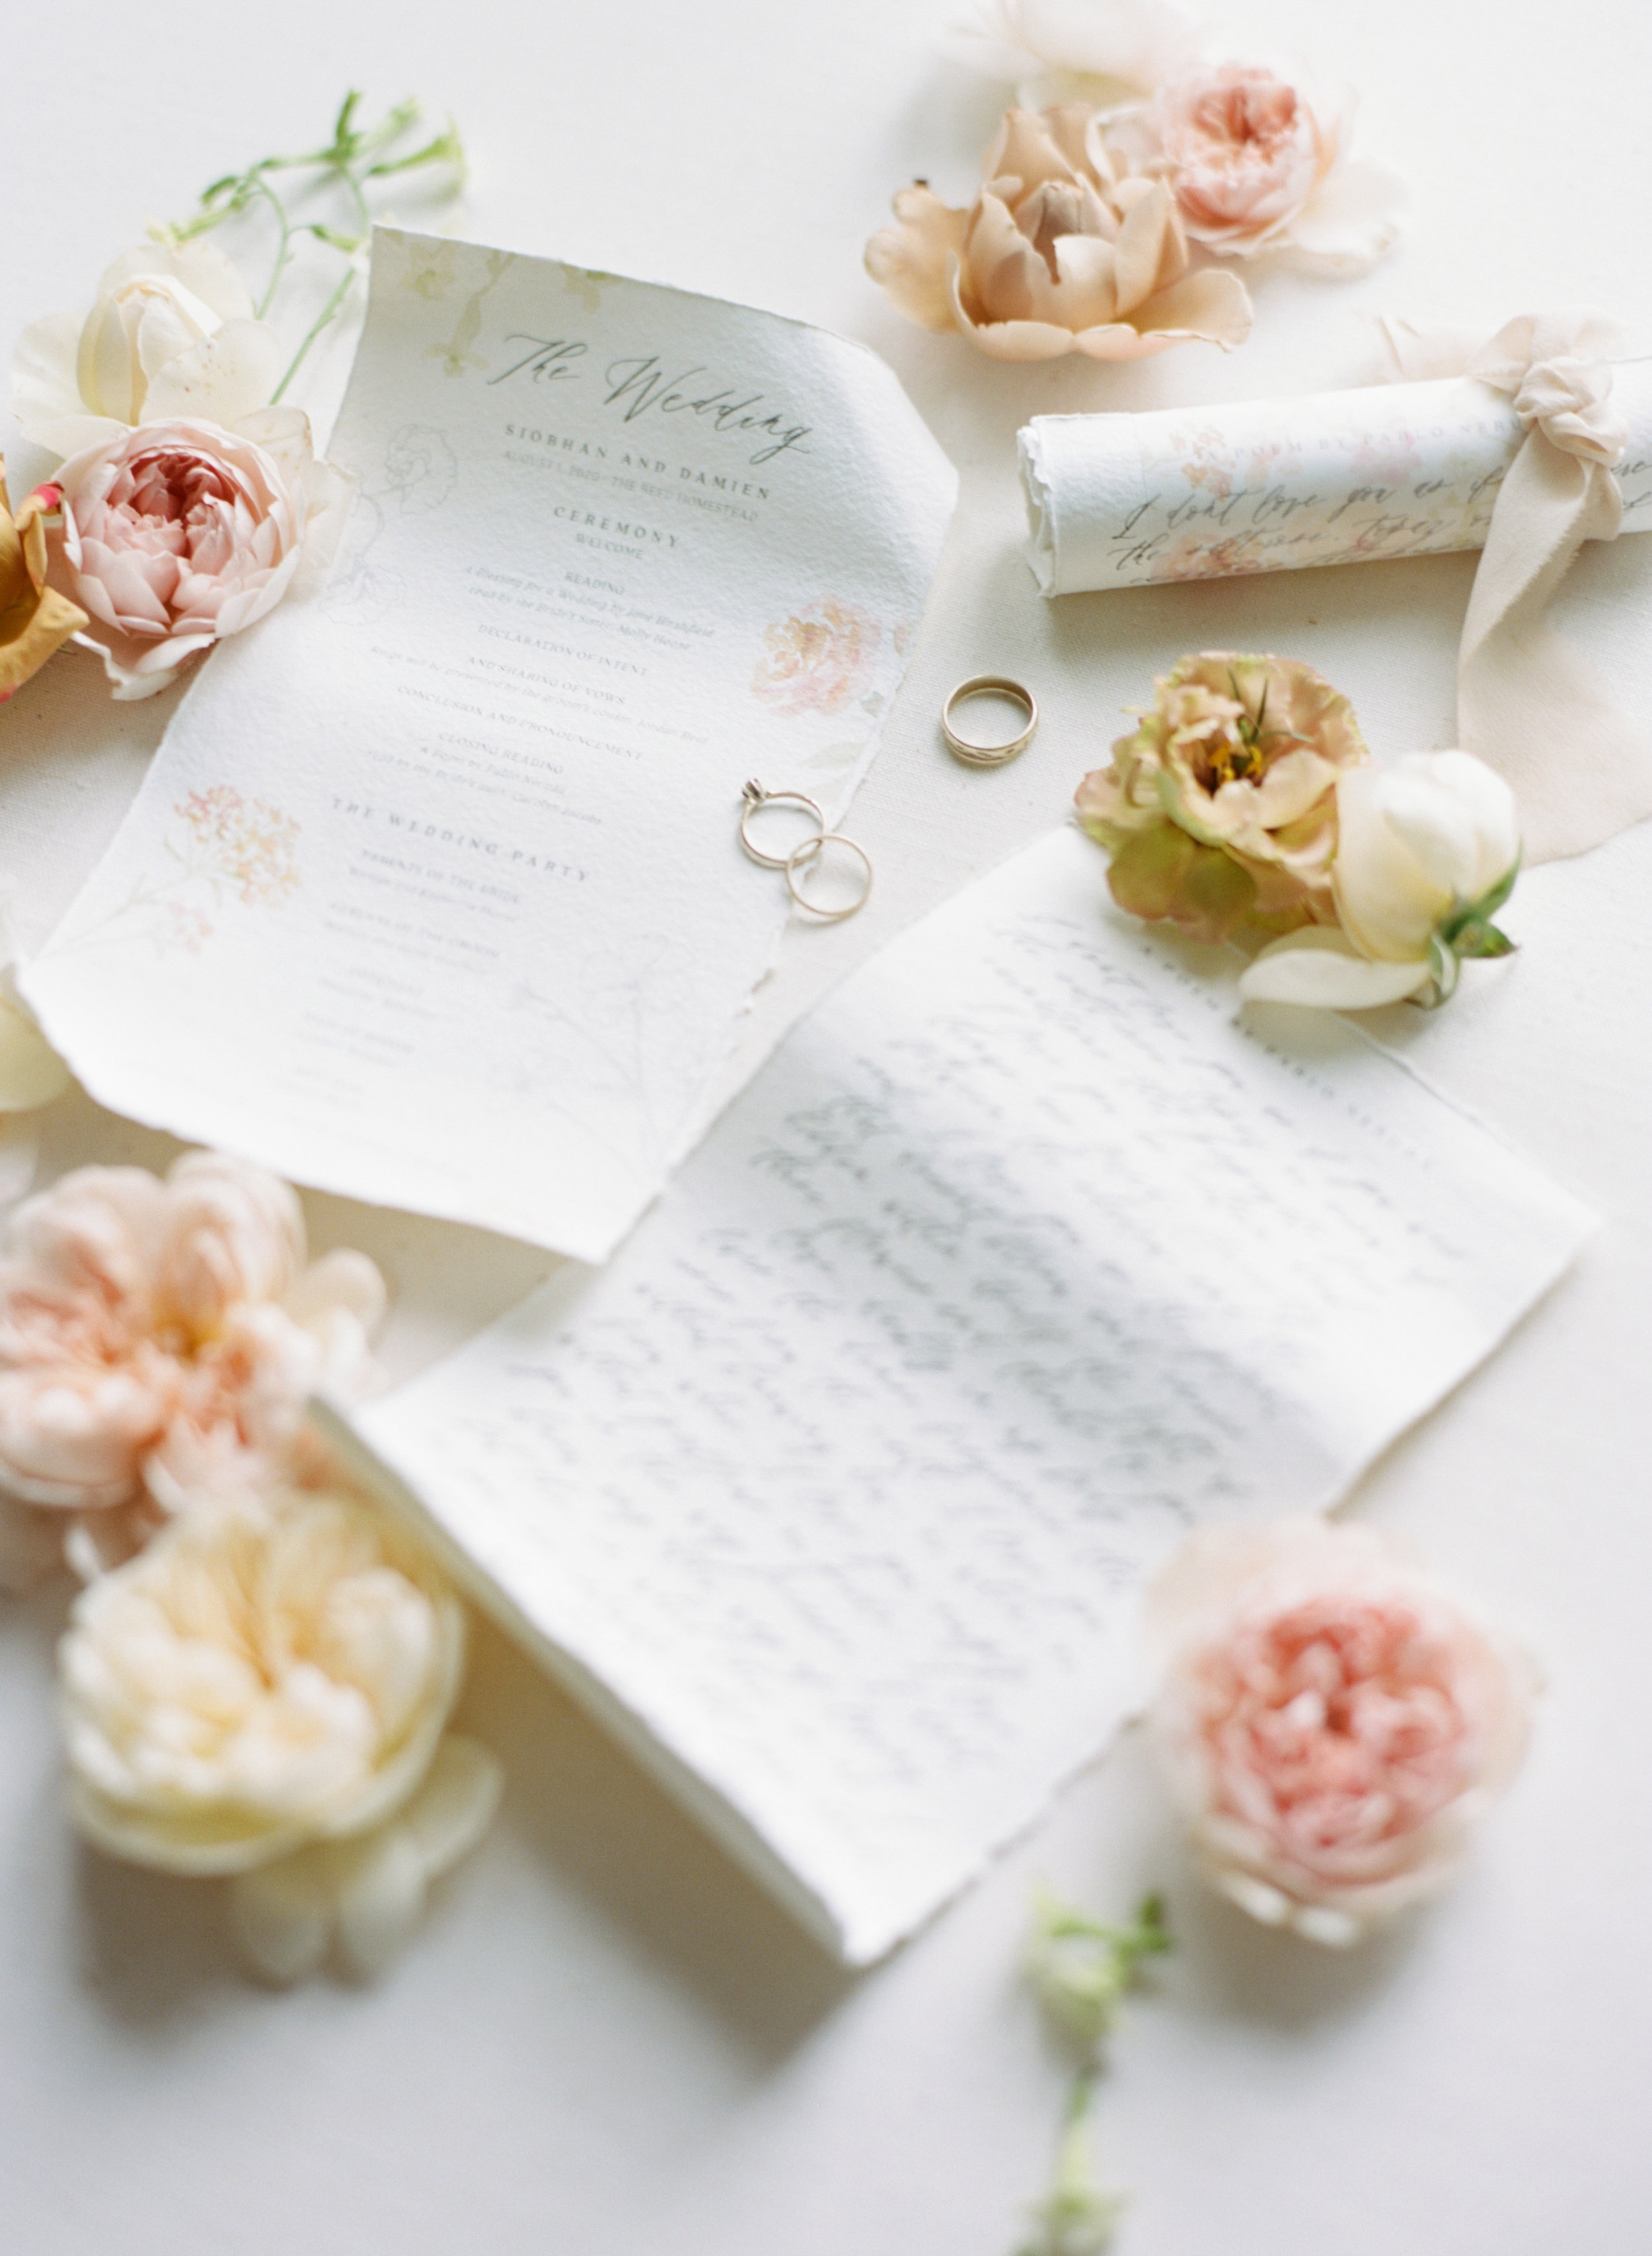 alexandra-meseke-understated-soft-luxury-wedding-upstate-ny_0023.jpg